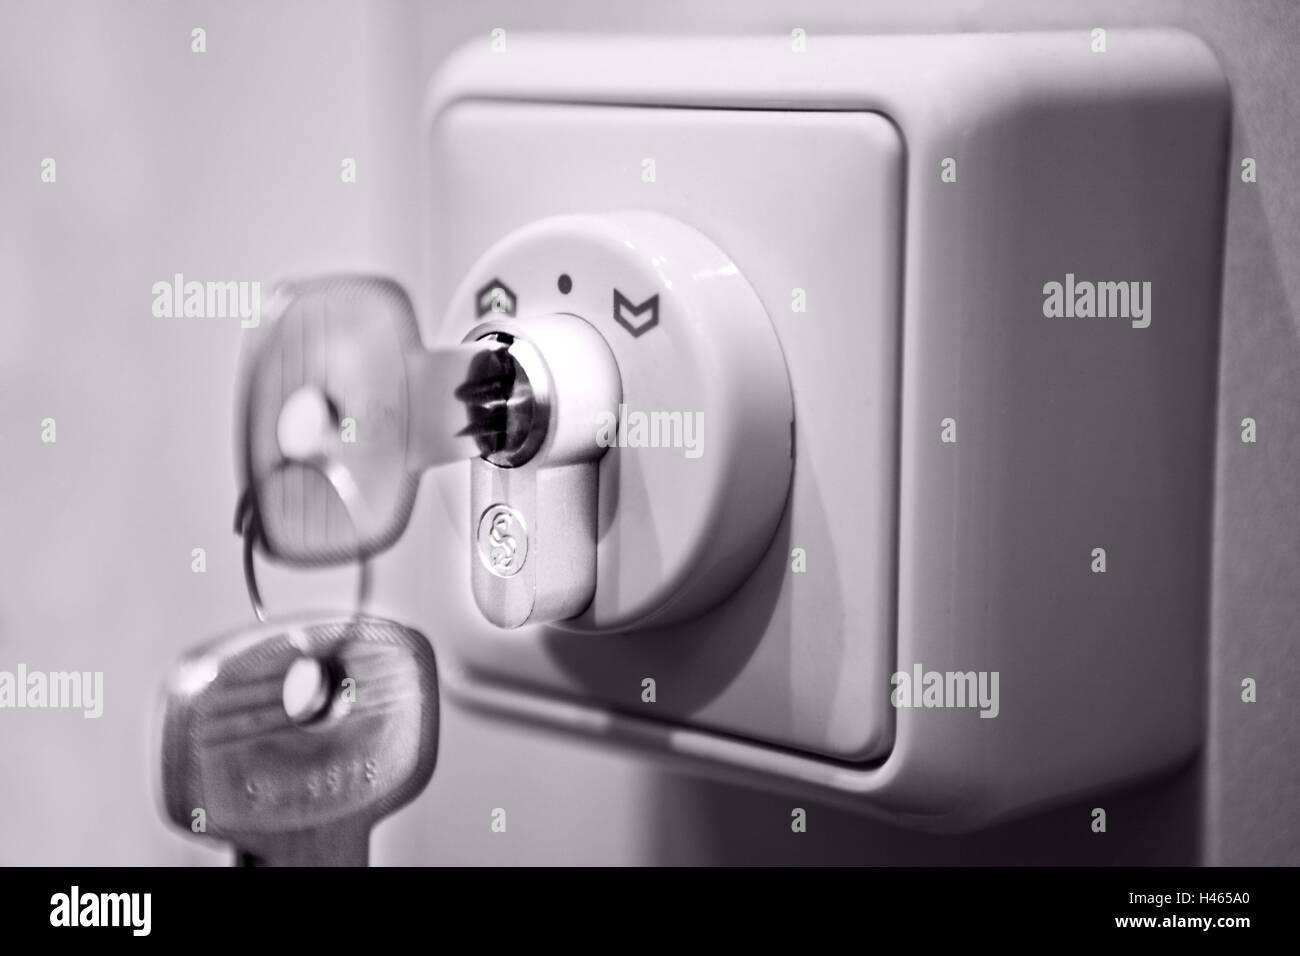 Jalousie Schalter Schlussel Stockfoto Bild 123067112 Alamy